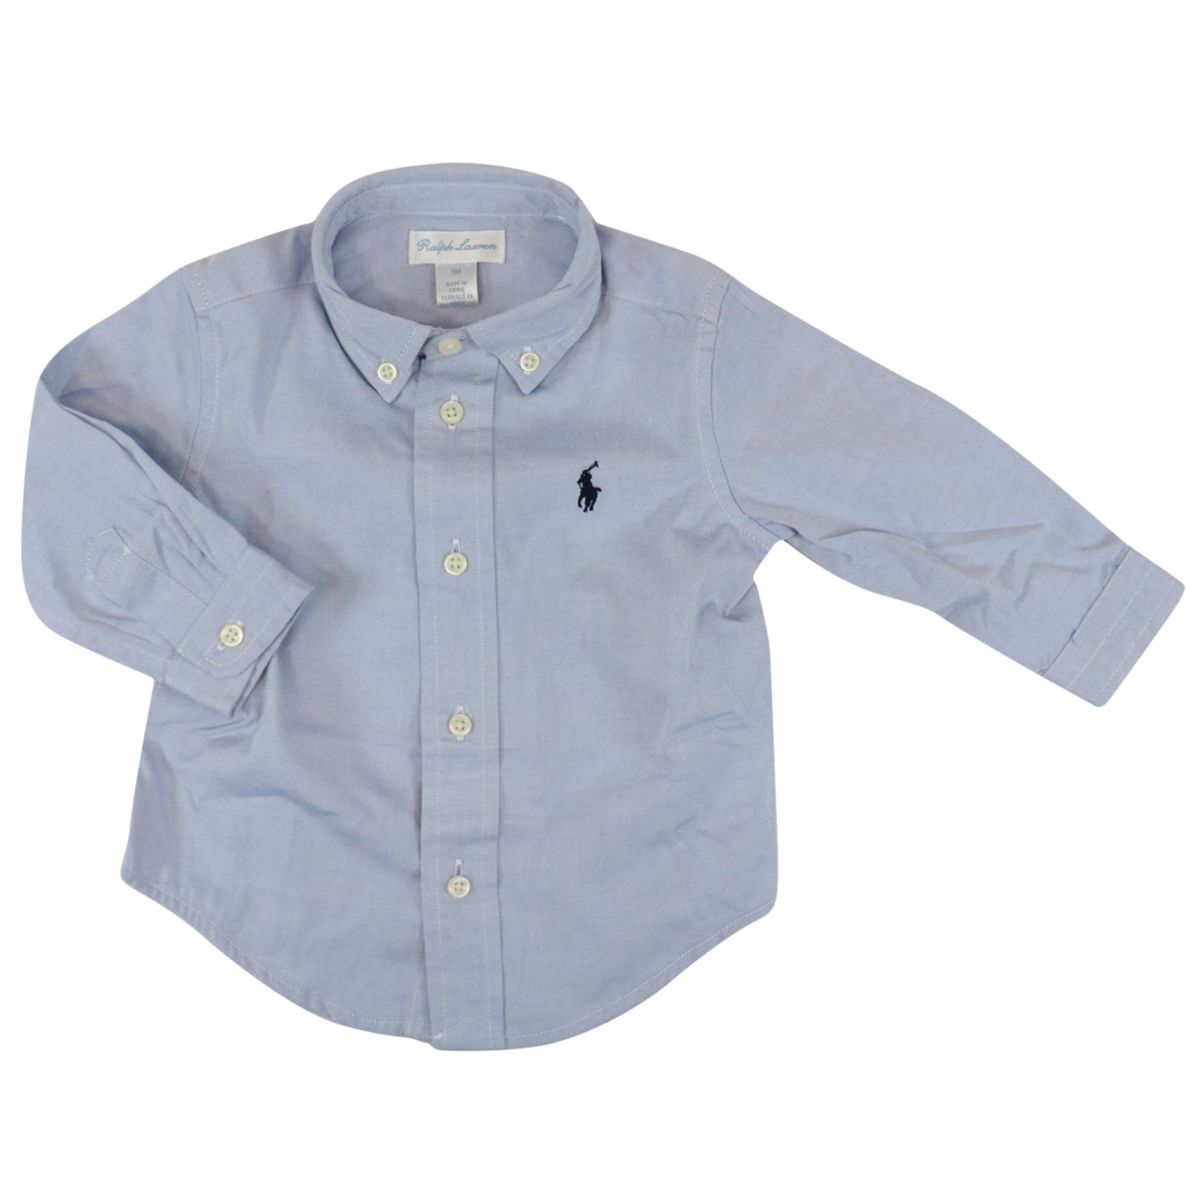 Long-sleeved botton down shirt in cotton Oxford blue Polo Ralph Lauren